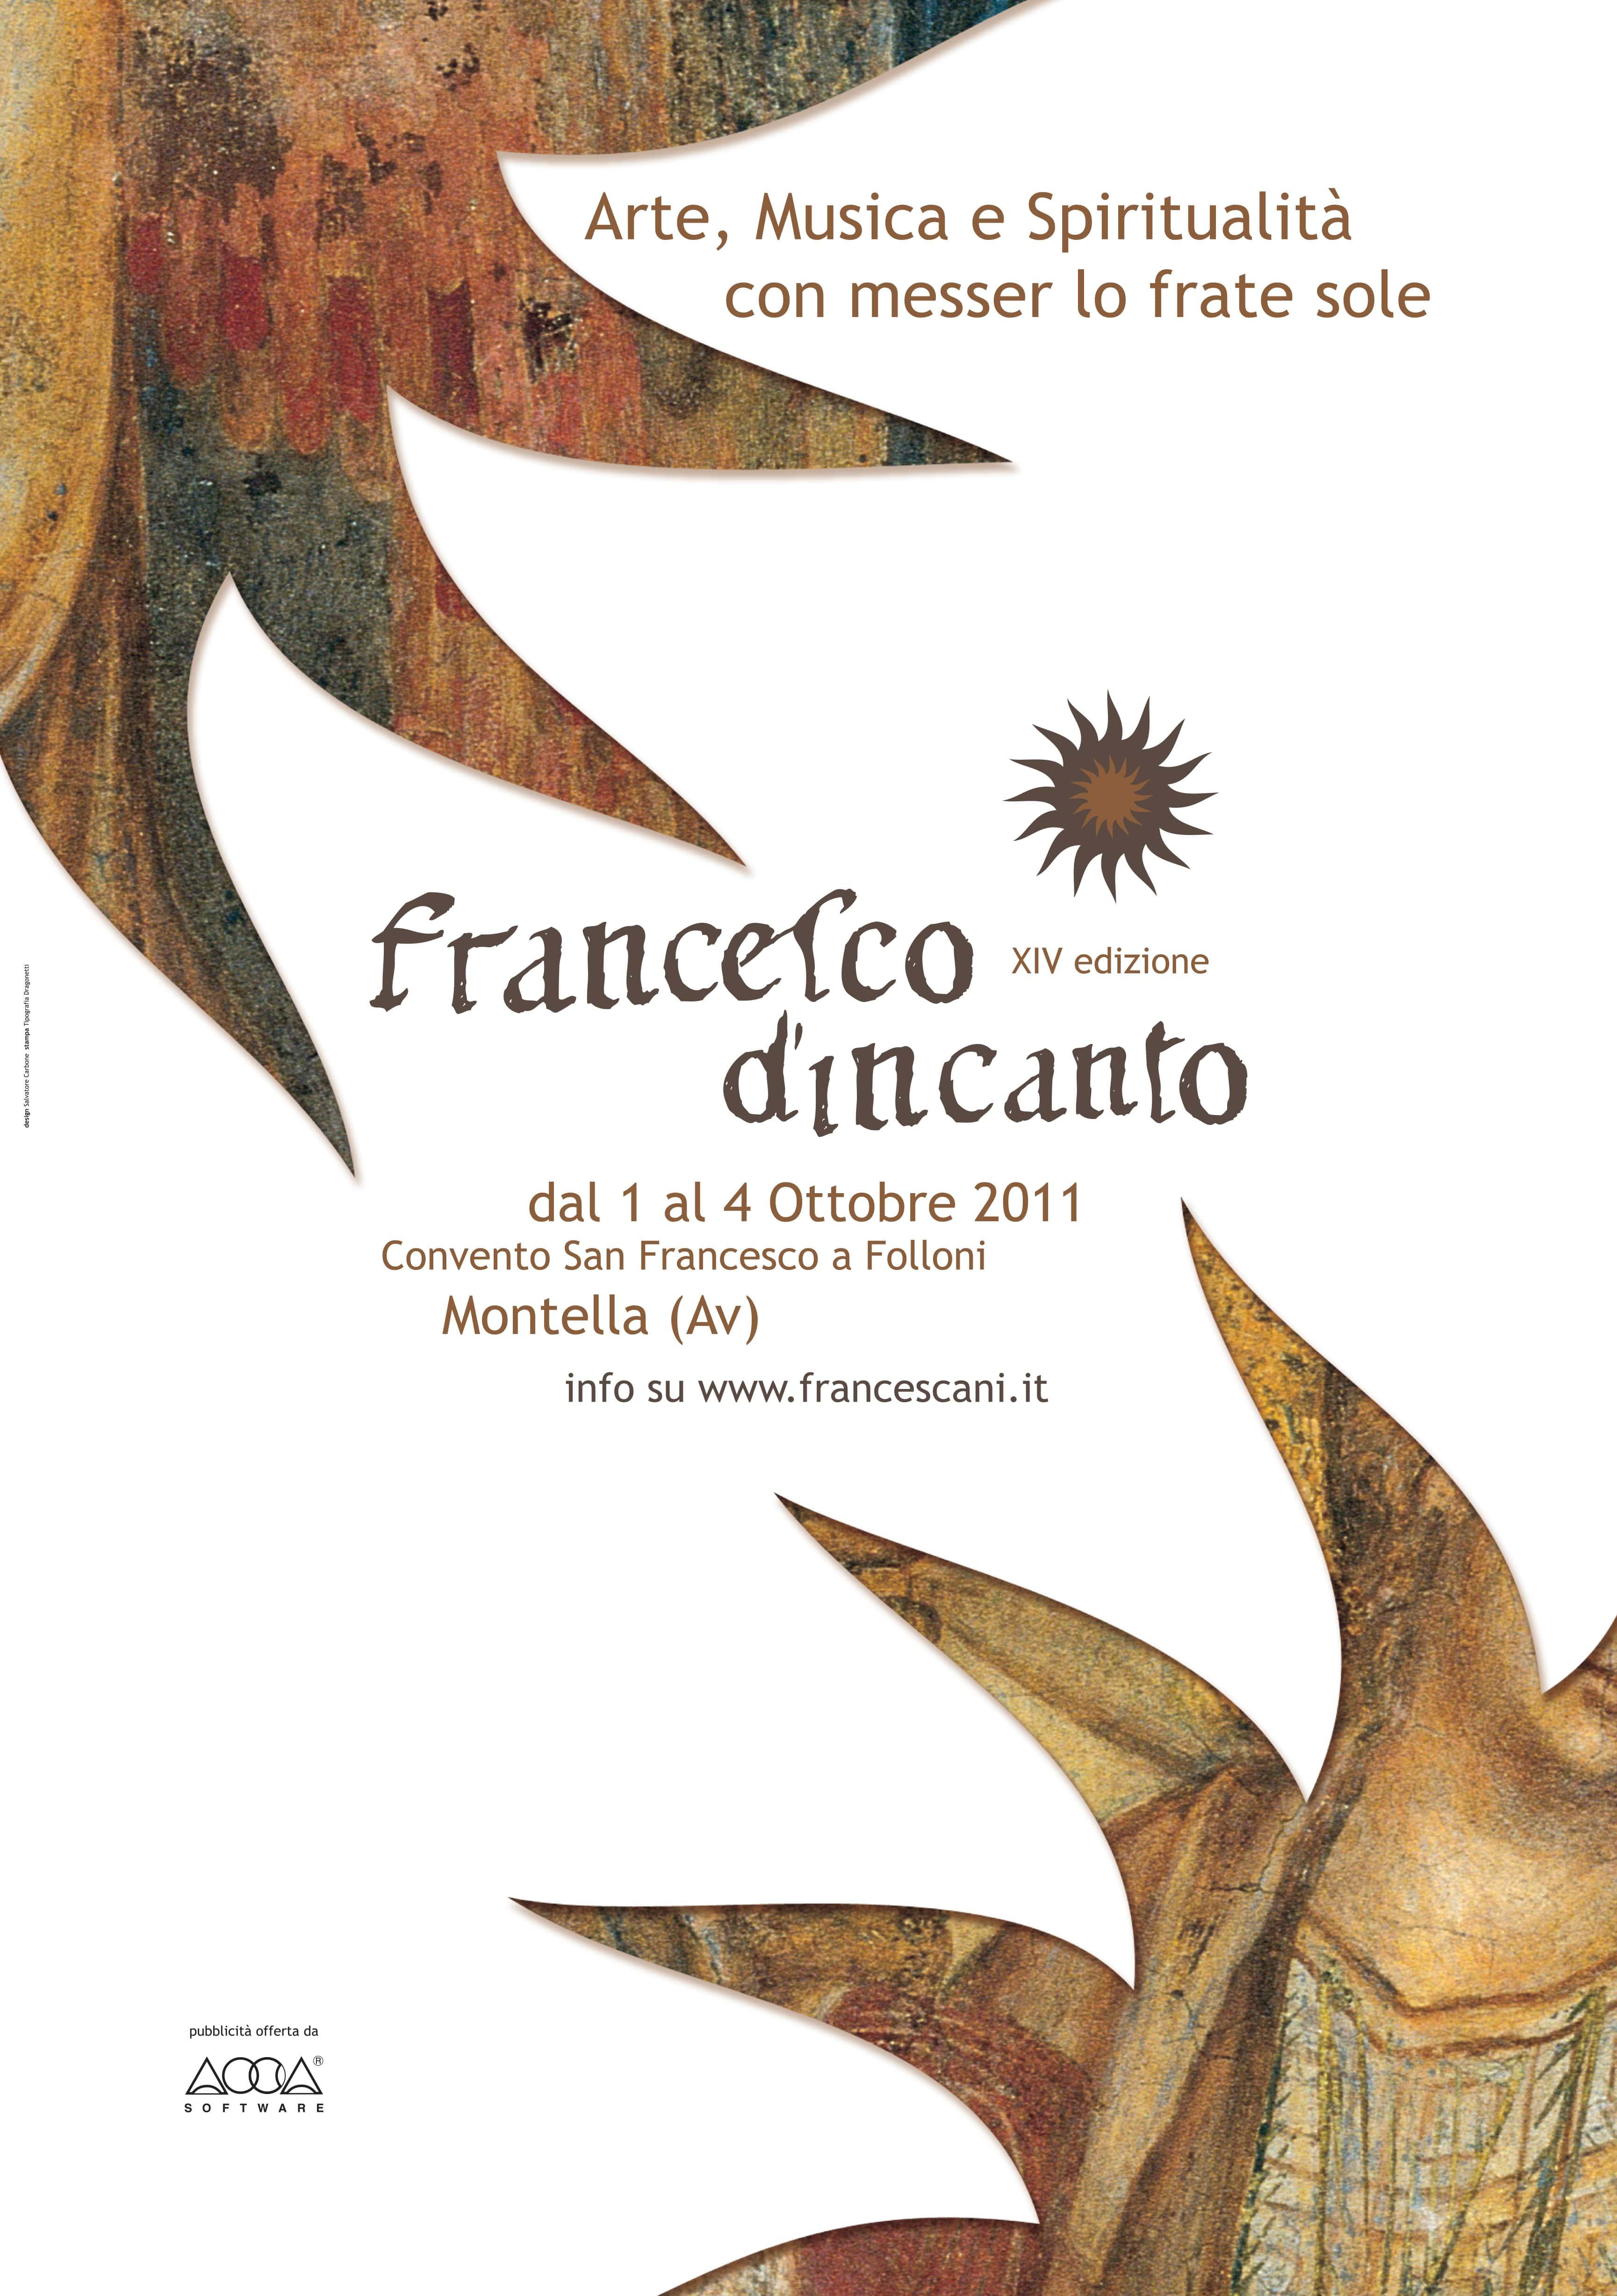 Francesco D'Incanto Locandina 2011